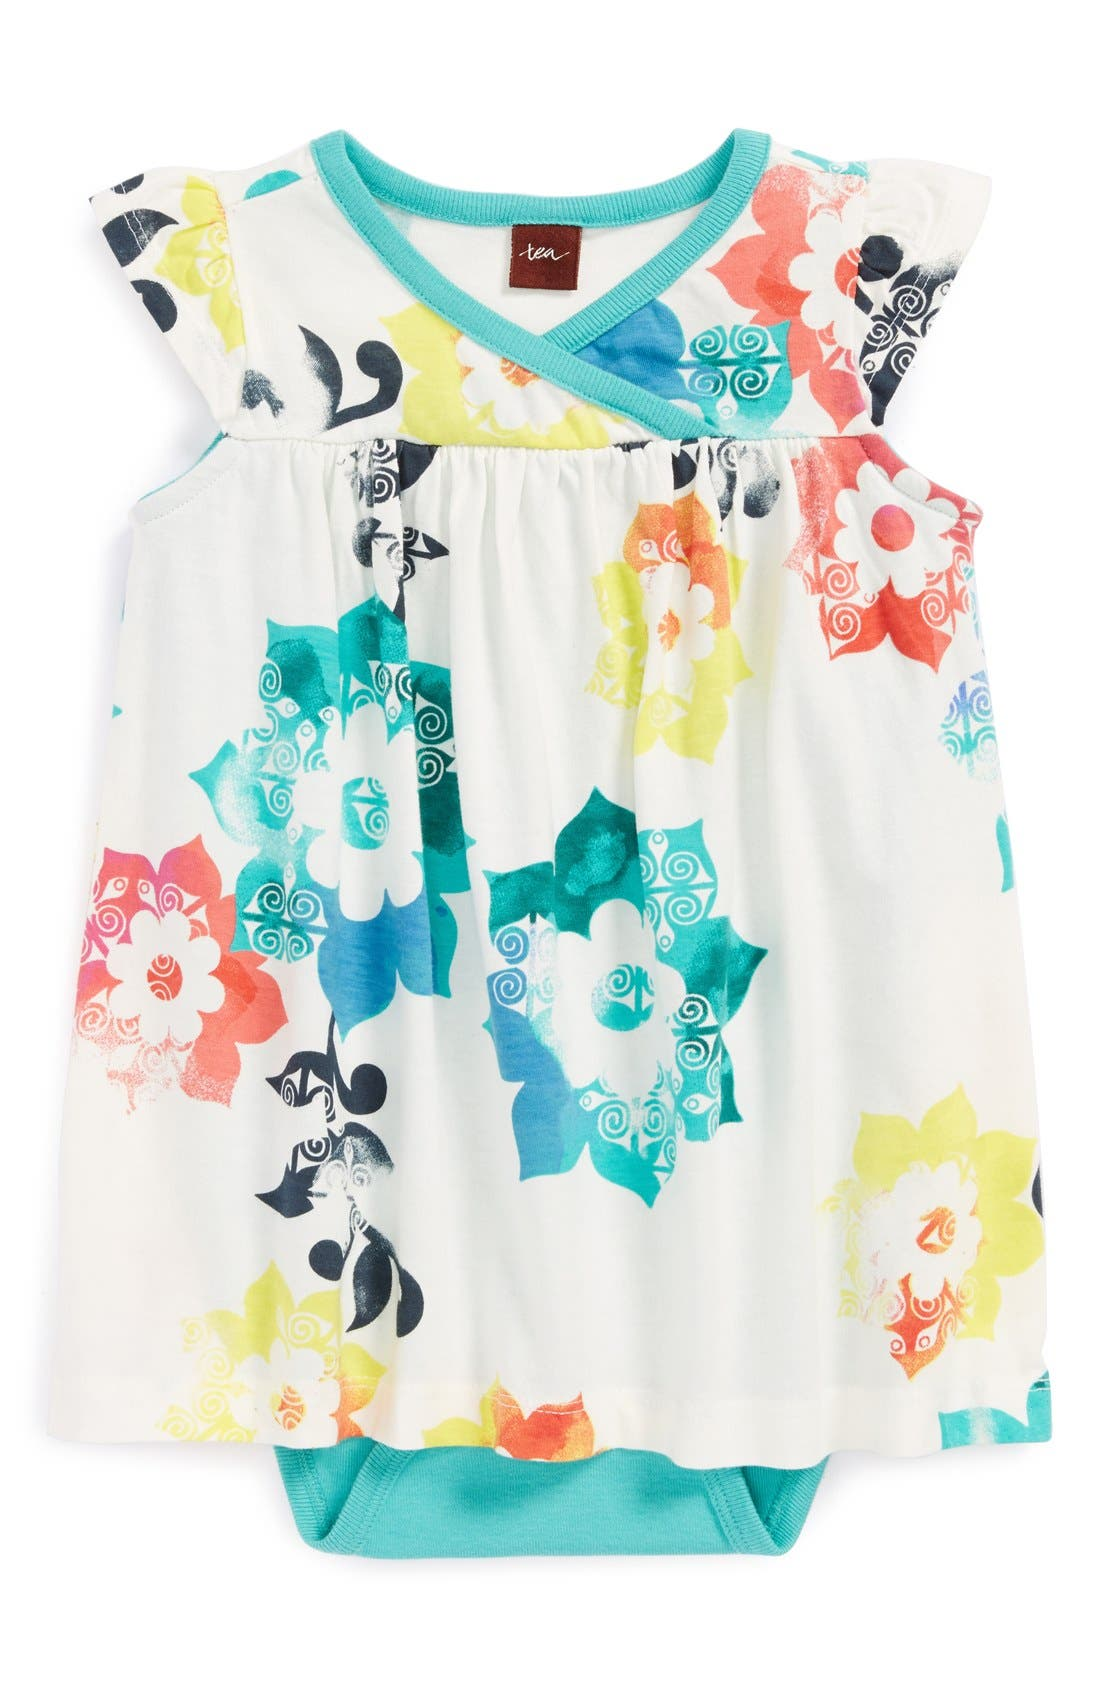 Alternate Image 1 Selected - Tea Collection 'Sandcastle Flower' Dress Bodysuit (Baby Girls)